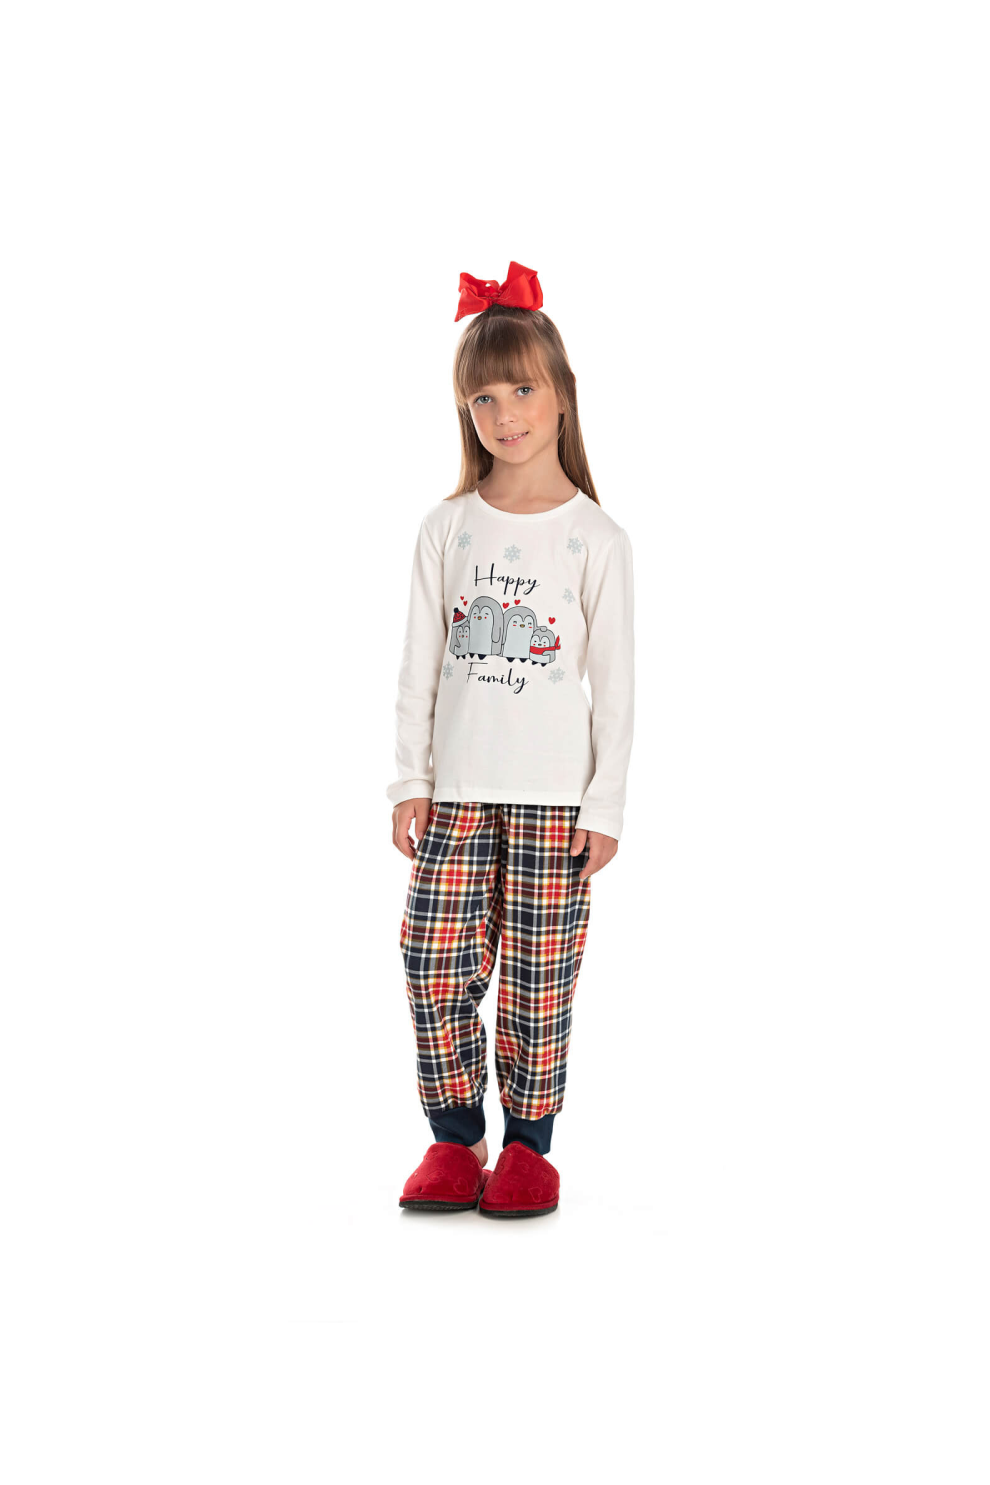 023/C - Pijama Infantil Feminino Happy Family